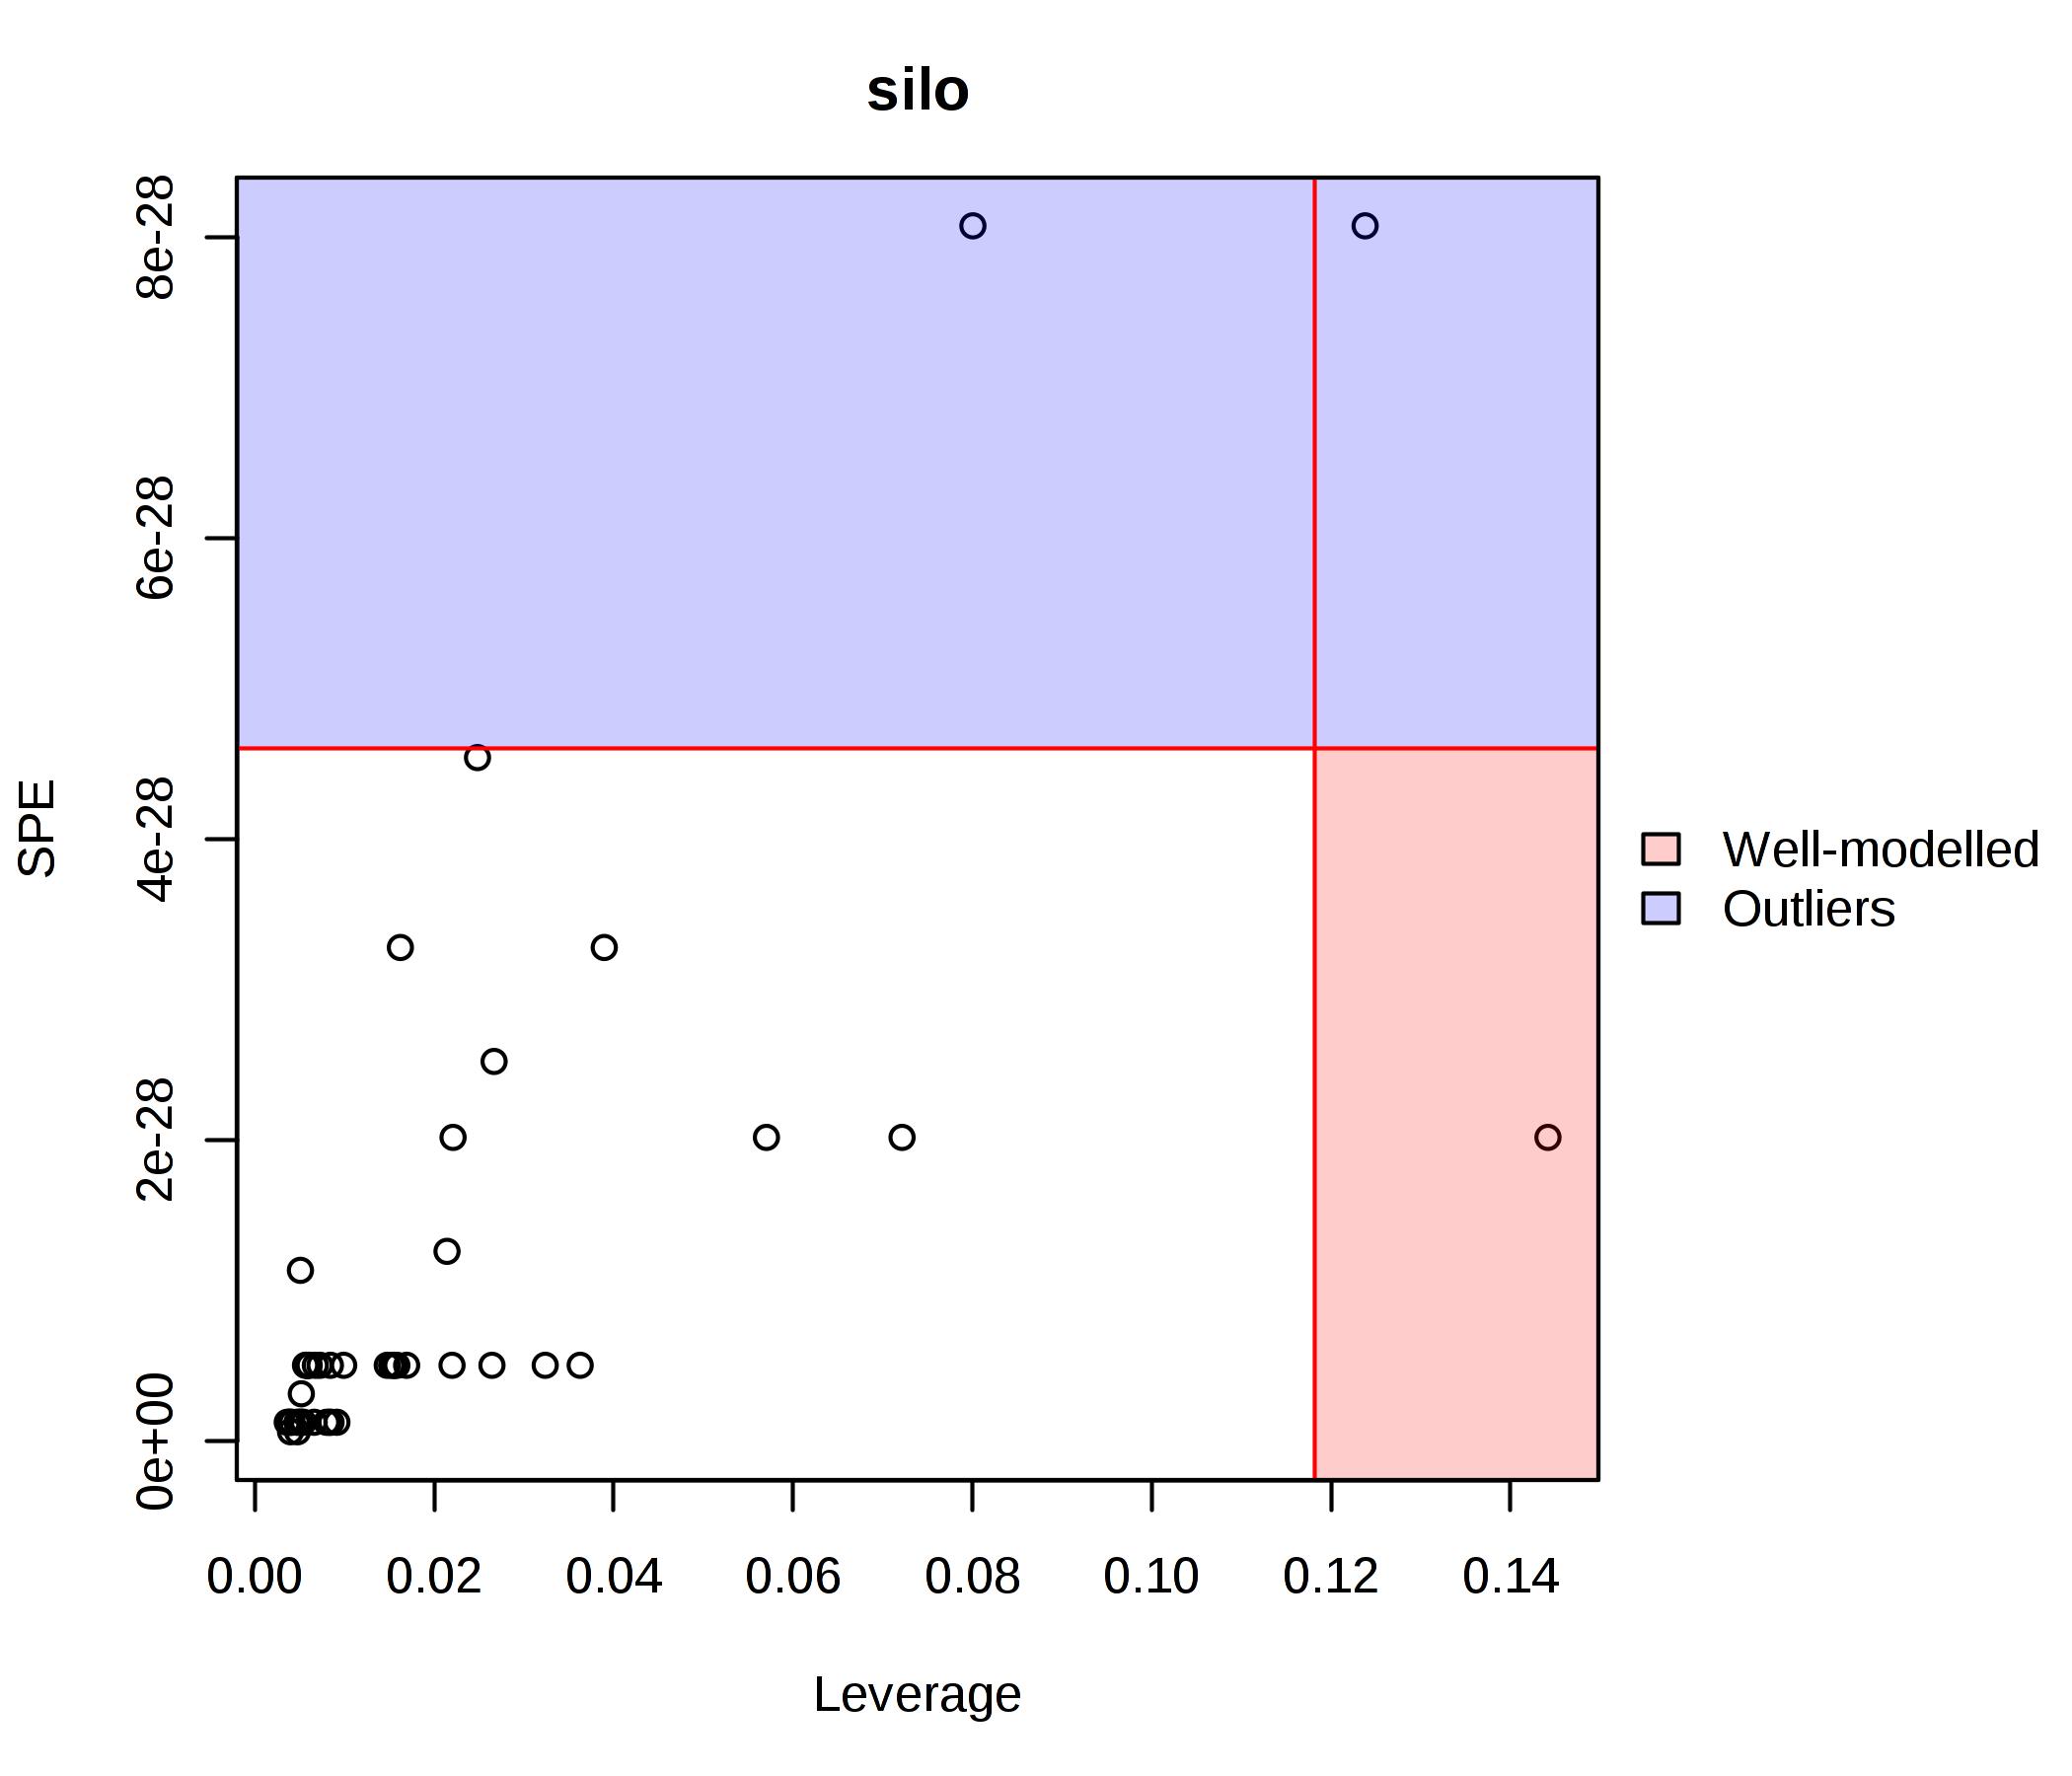 ASCA outlier x leaverage plot for temperature